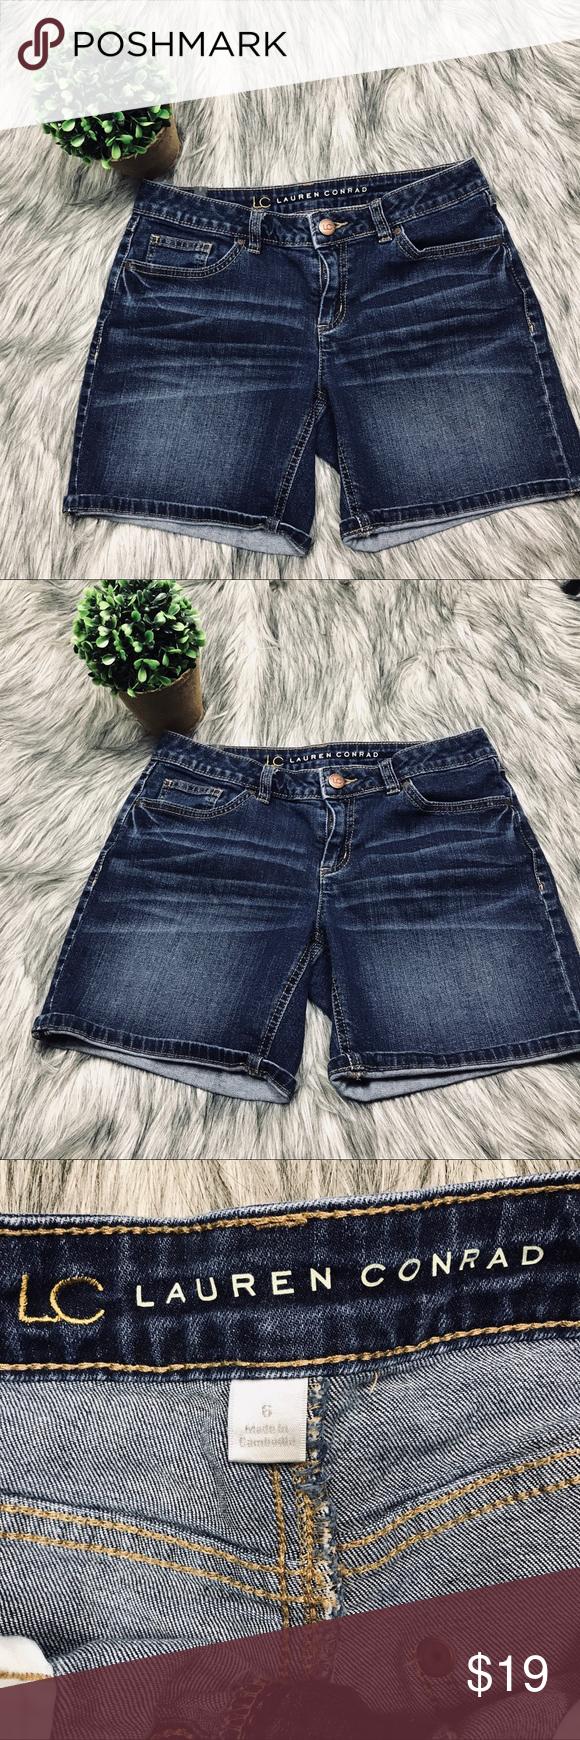 LC Lauren Conrad shorts   Lc lauren conrad, Clothes design